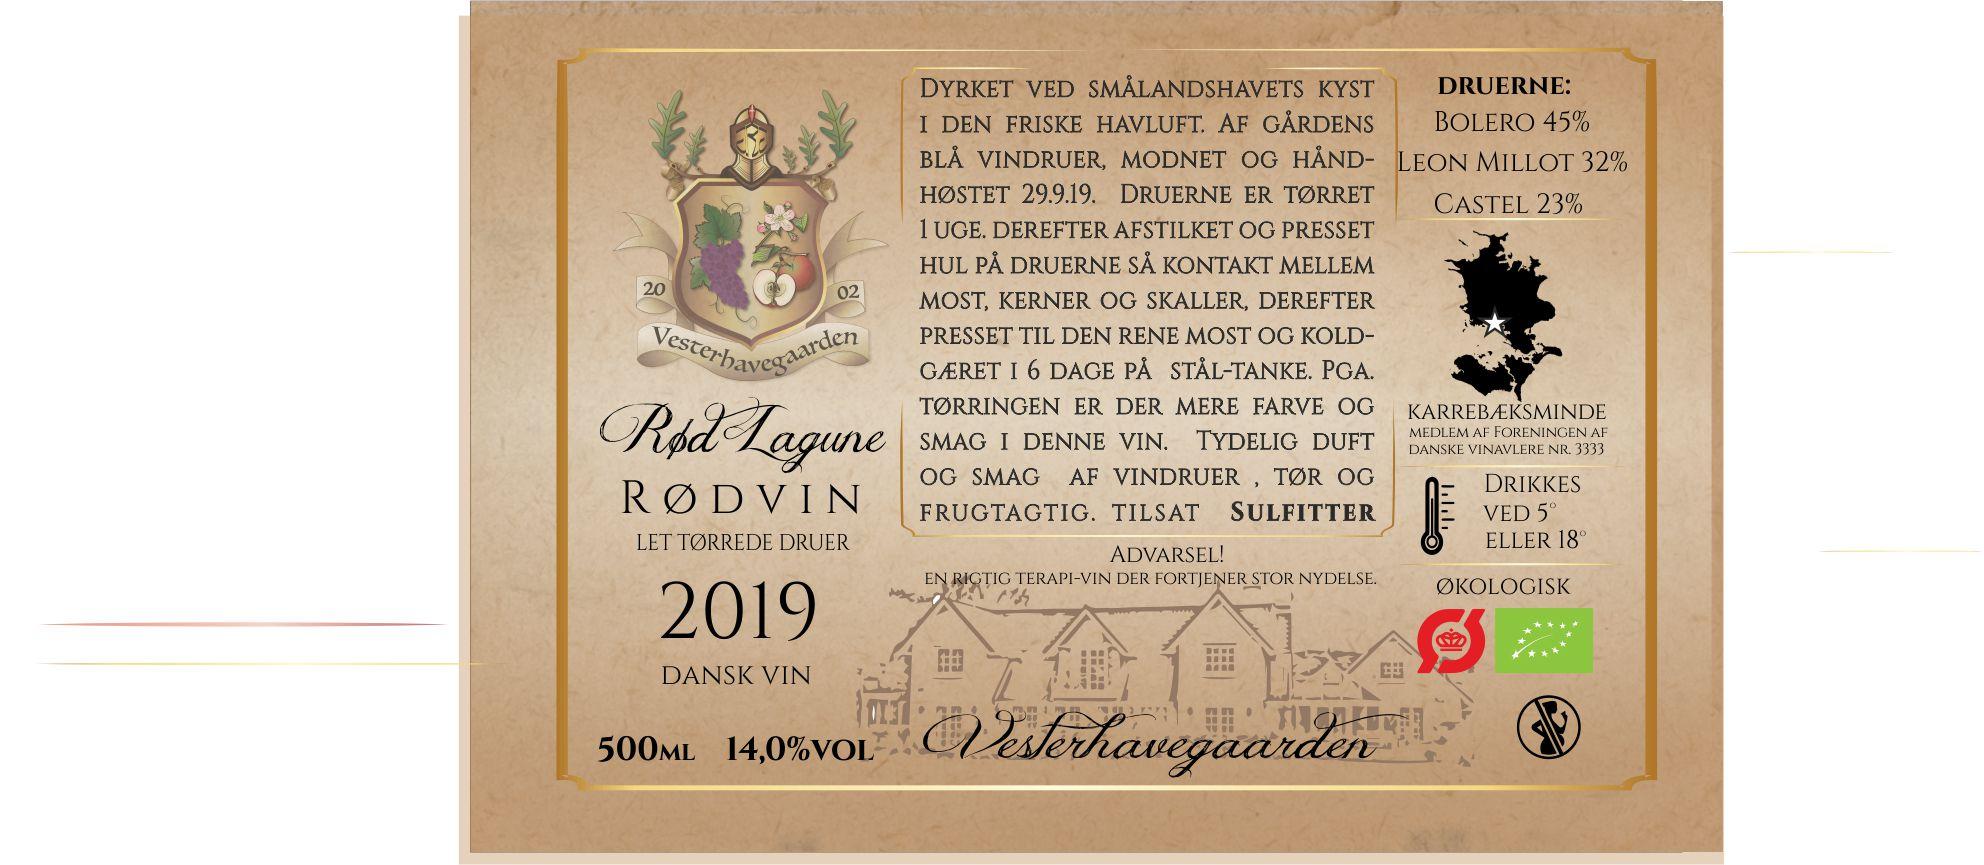 RØDVIN, RØD LAGUNE 1, 2019, 50cl